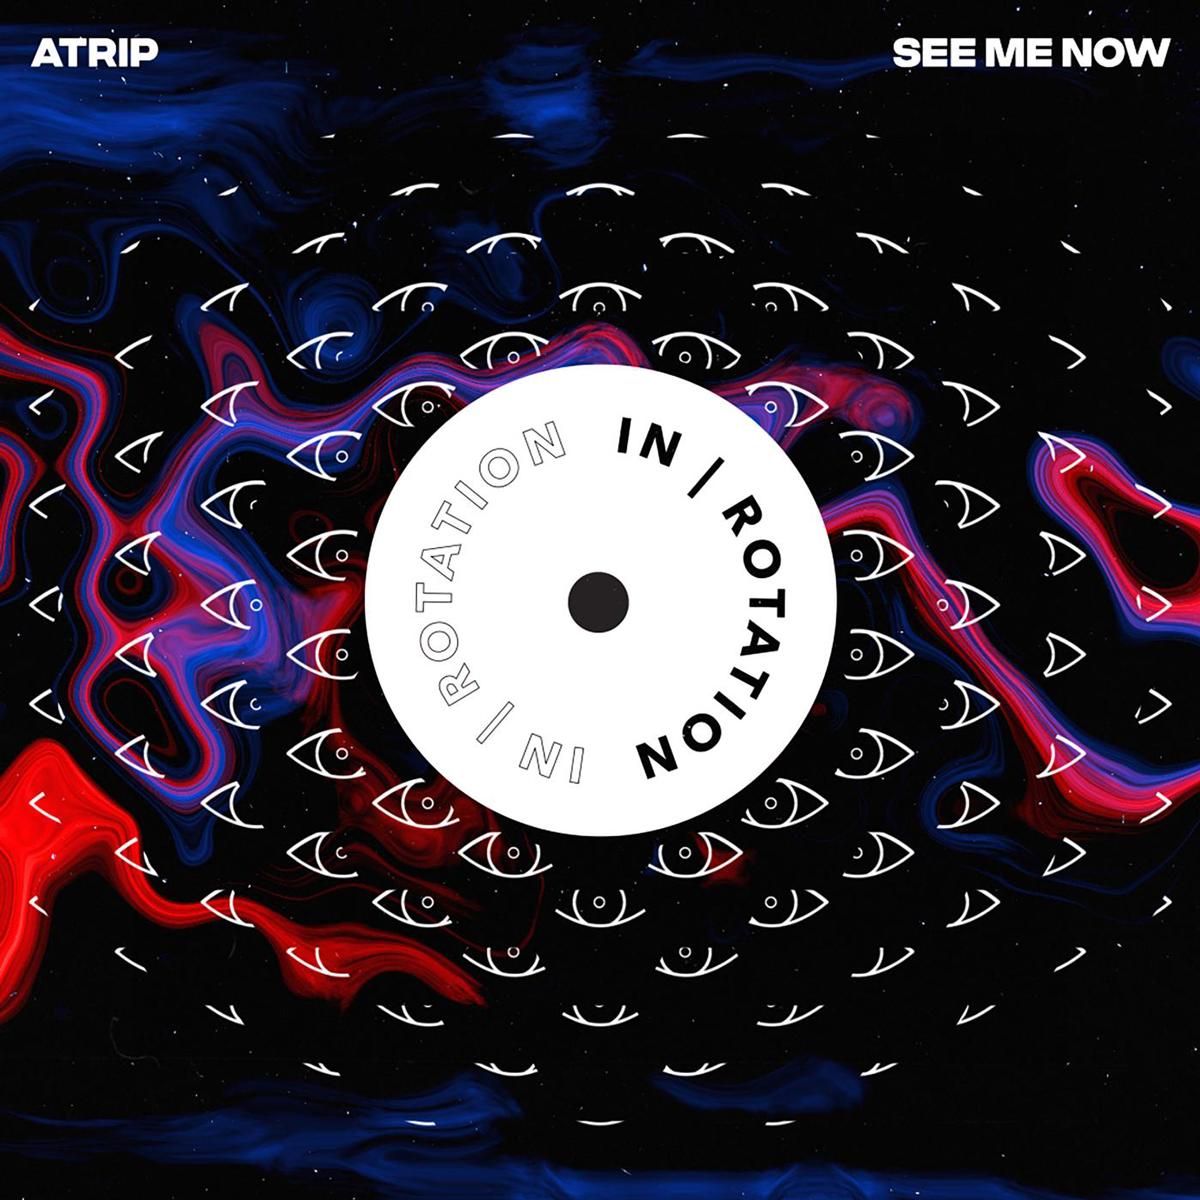 ATRIP---See-Me-Now